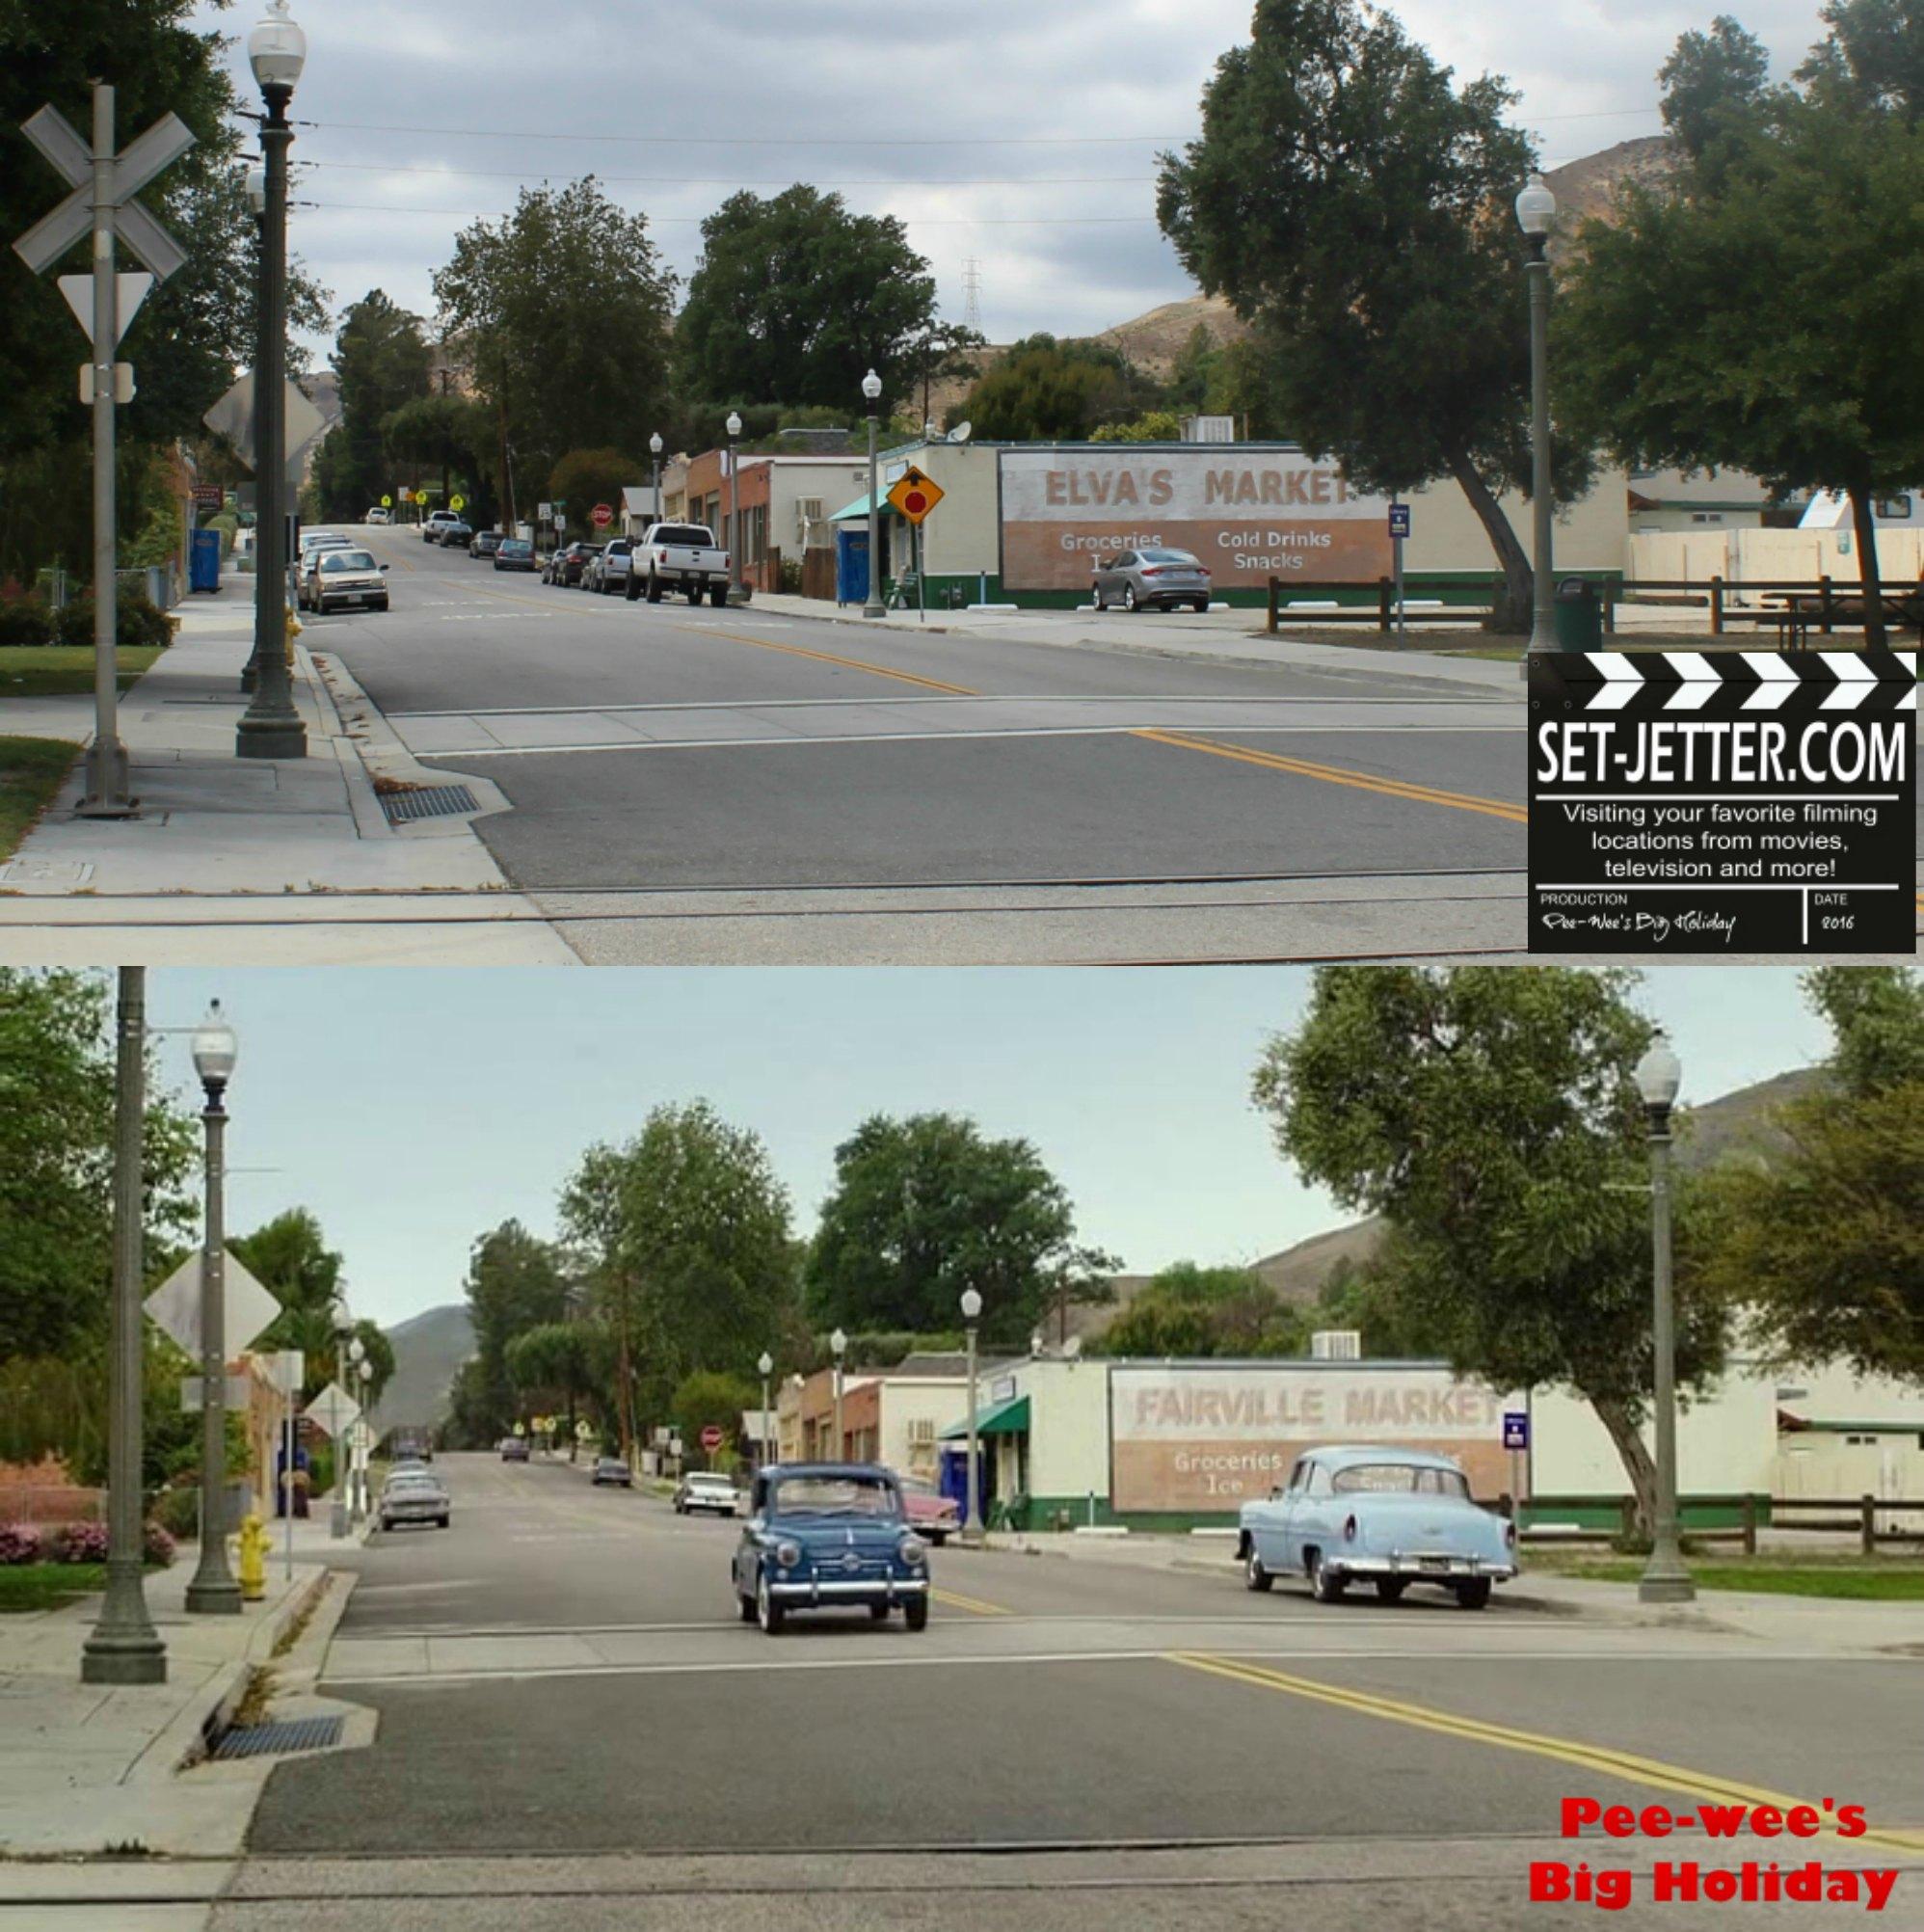 Pee Wee's Big Holiday comparison 324.jpg